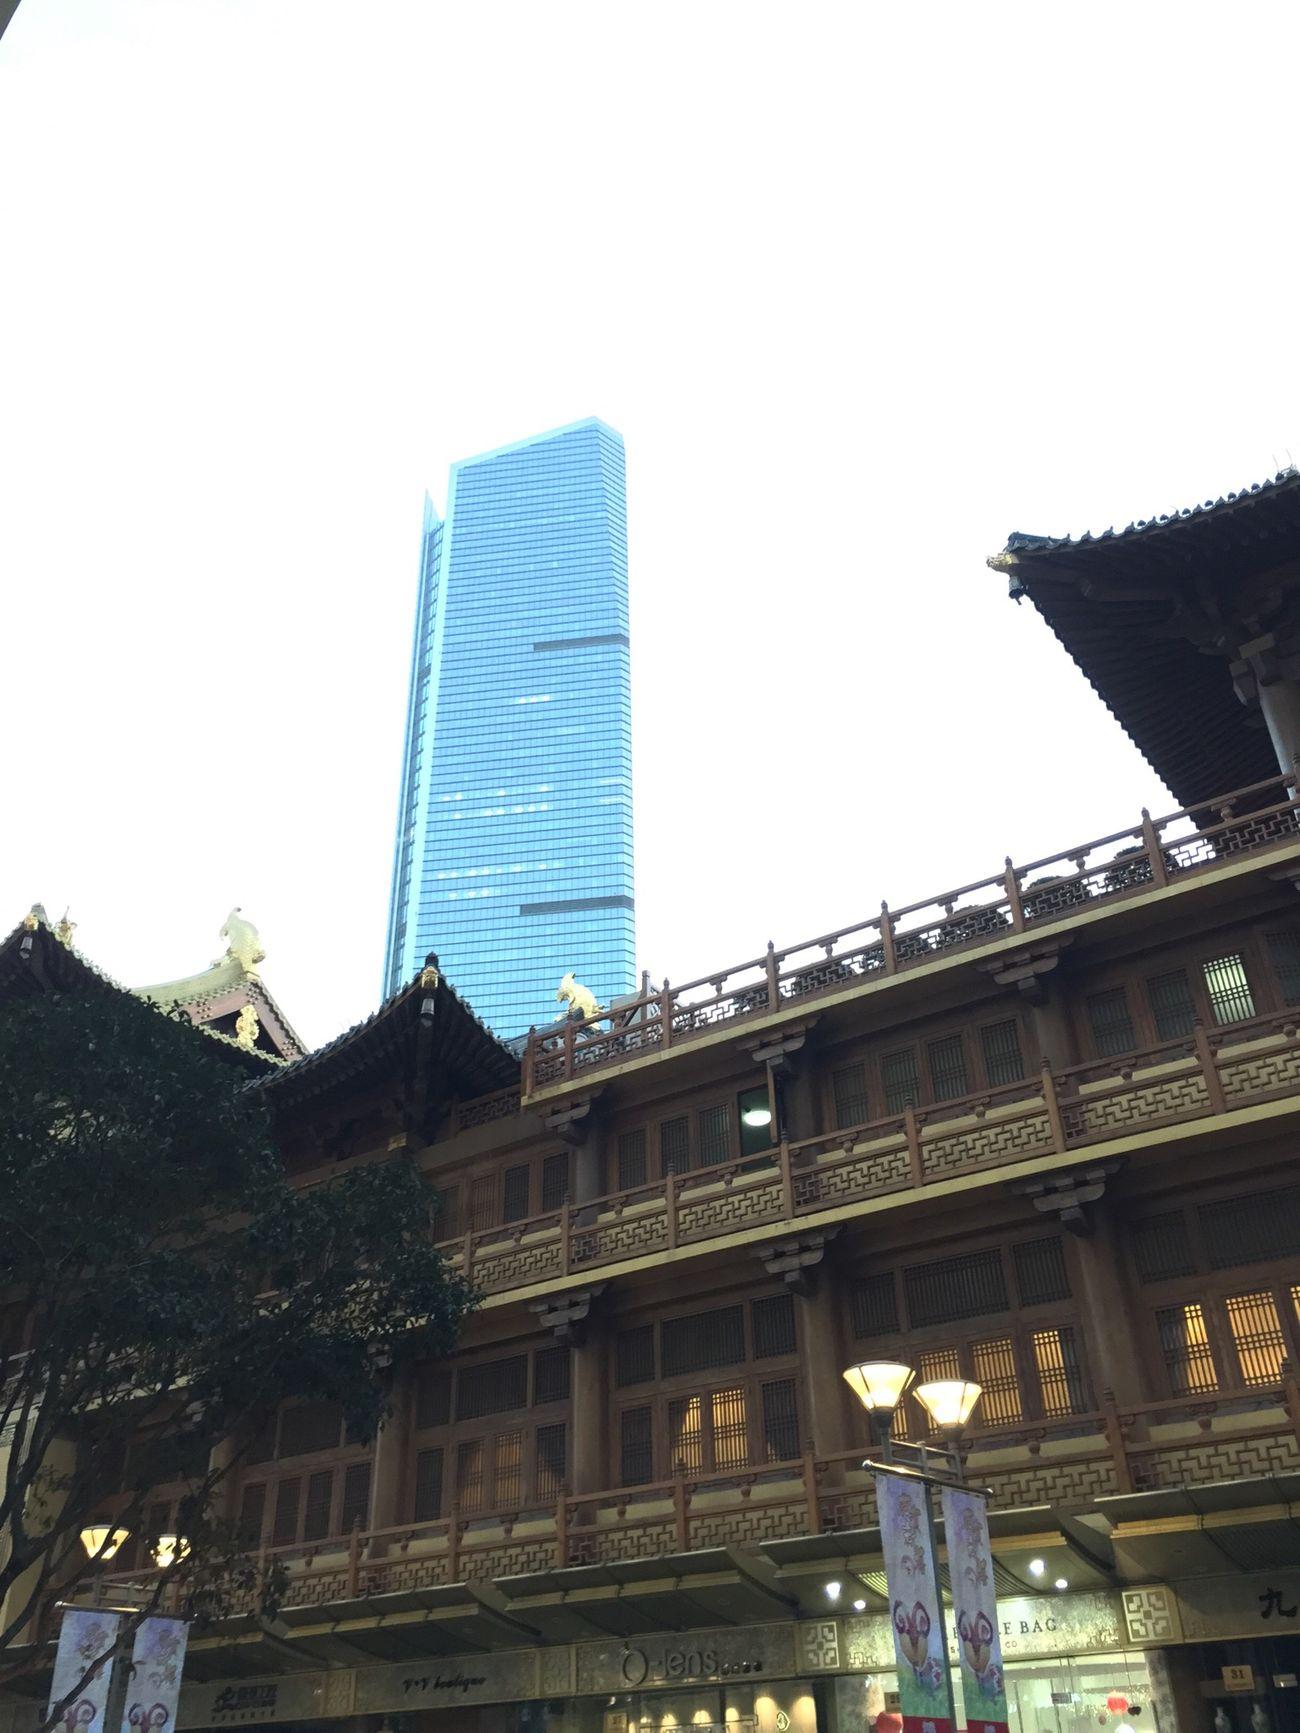 Modern city, ancient glory. Happy CNY!